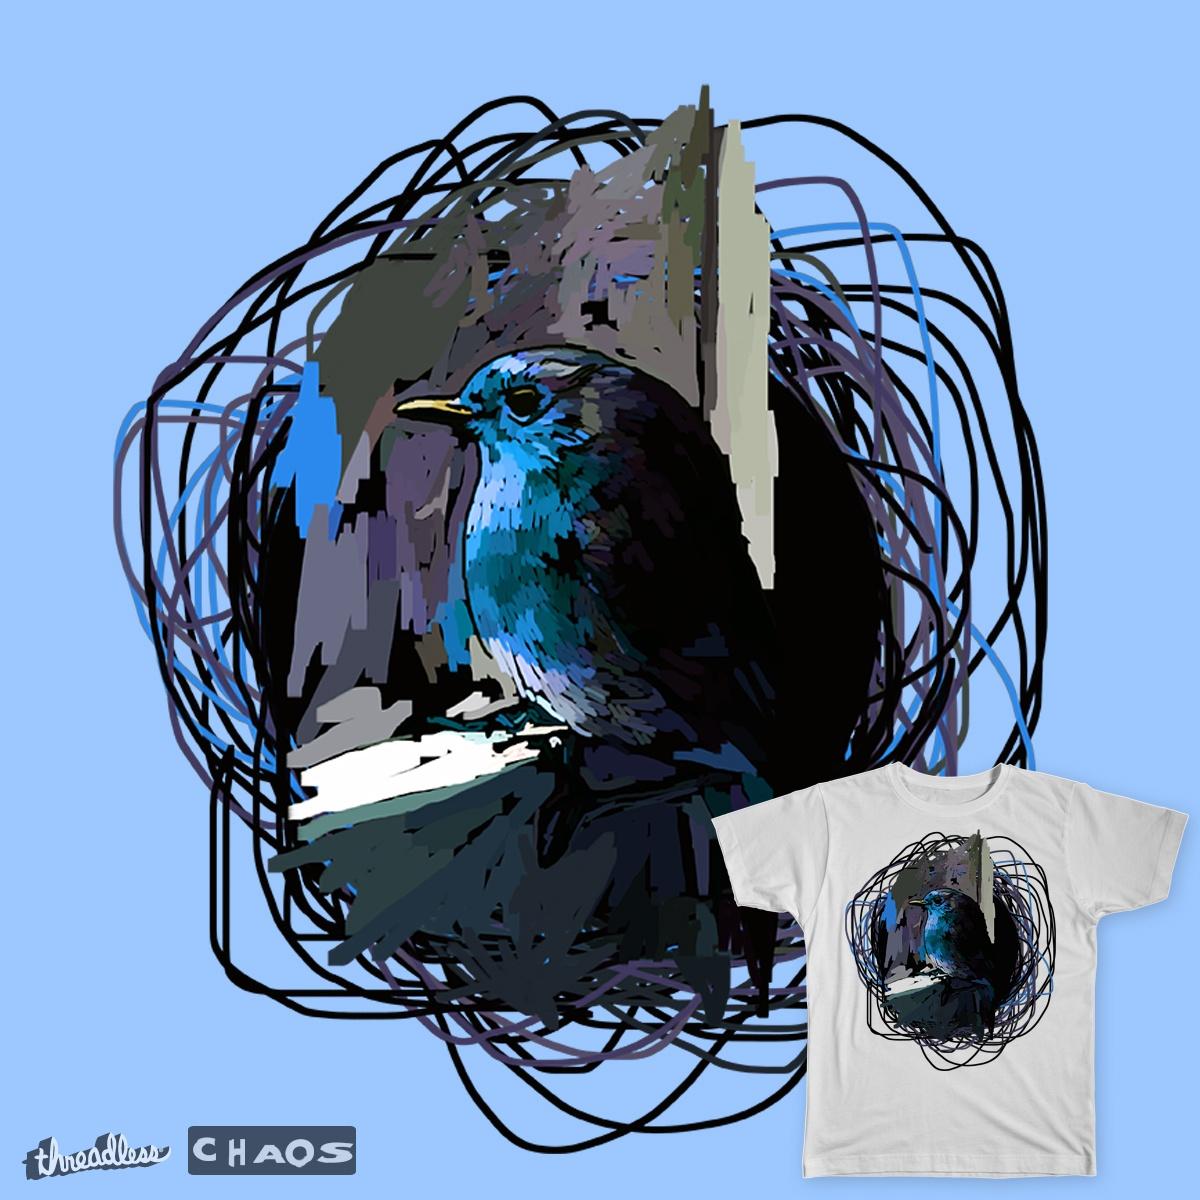 Blue Robin by gr4v17 on Threadless